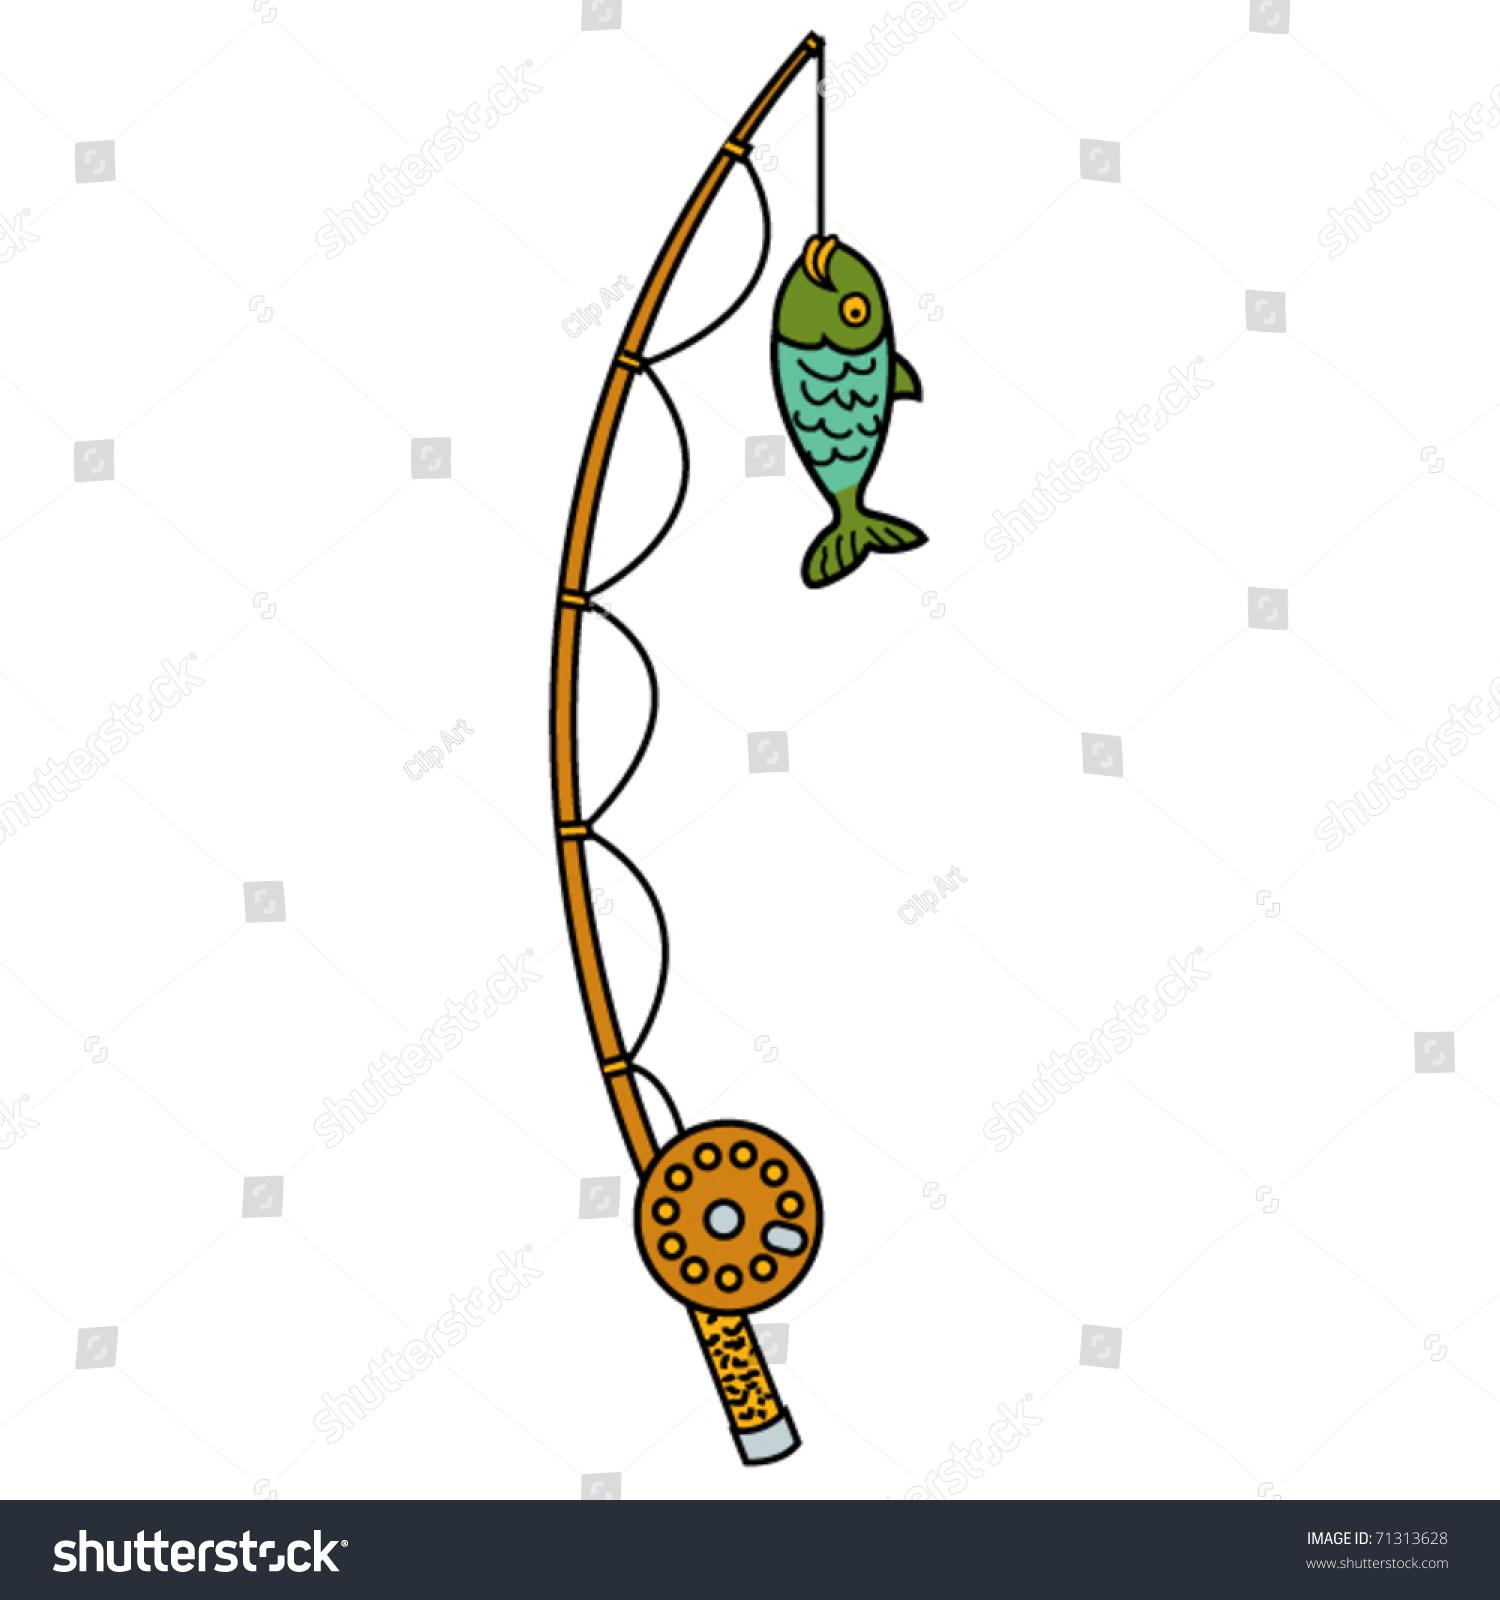 fishing pole reel fish stock vector 71313628 - shutterstock, Fishing Rod